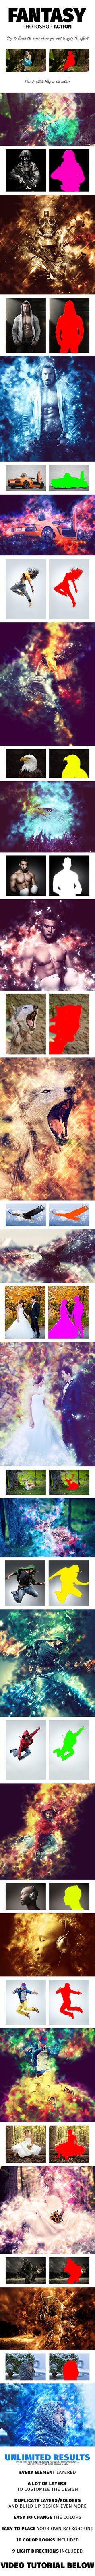 Fantasy Photoshop Action #photoeffect Download: http://graphicriver.net/item/fantasy-photoshop-action/10707714?ref=ksioks